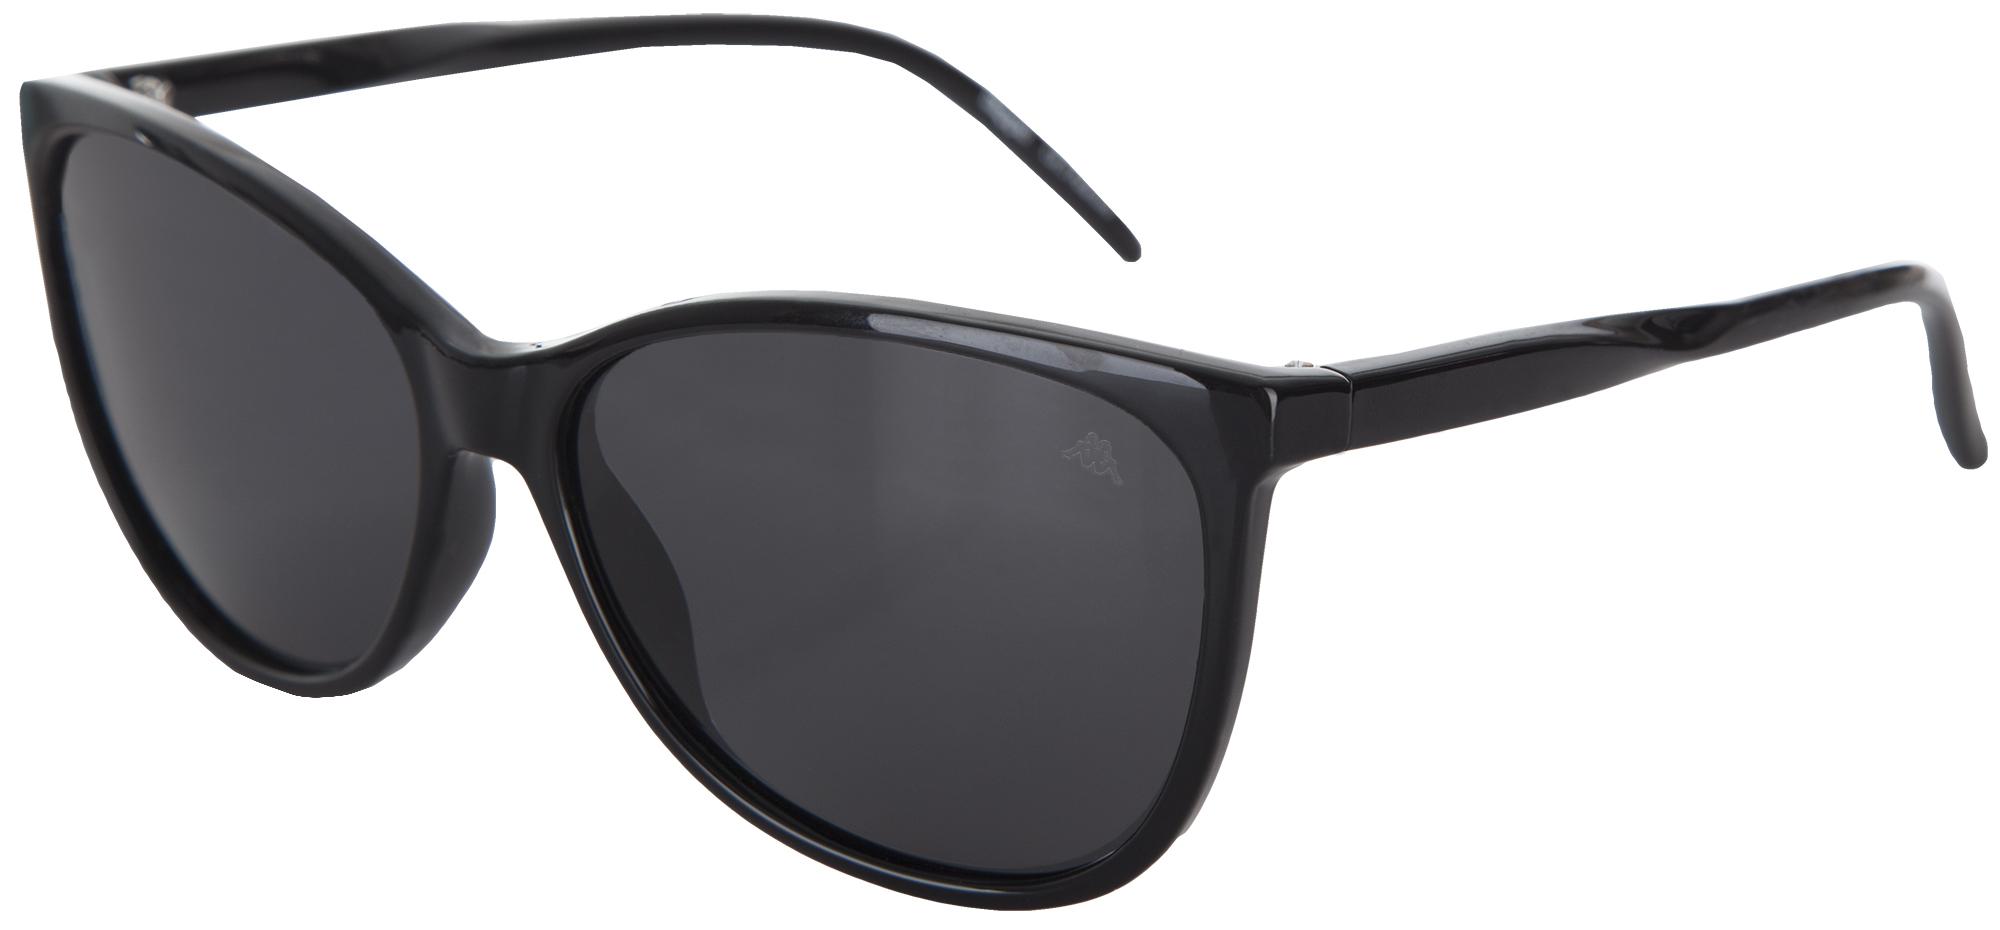 Kappa Солнцезащитные очки Kappa vogue vogel синий кадр серый градиент объектив солнцезащитные очки моды полные оправе очки солнцезащитные очки vo2993sf 235611 57мм